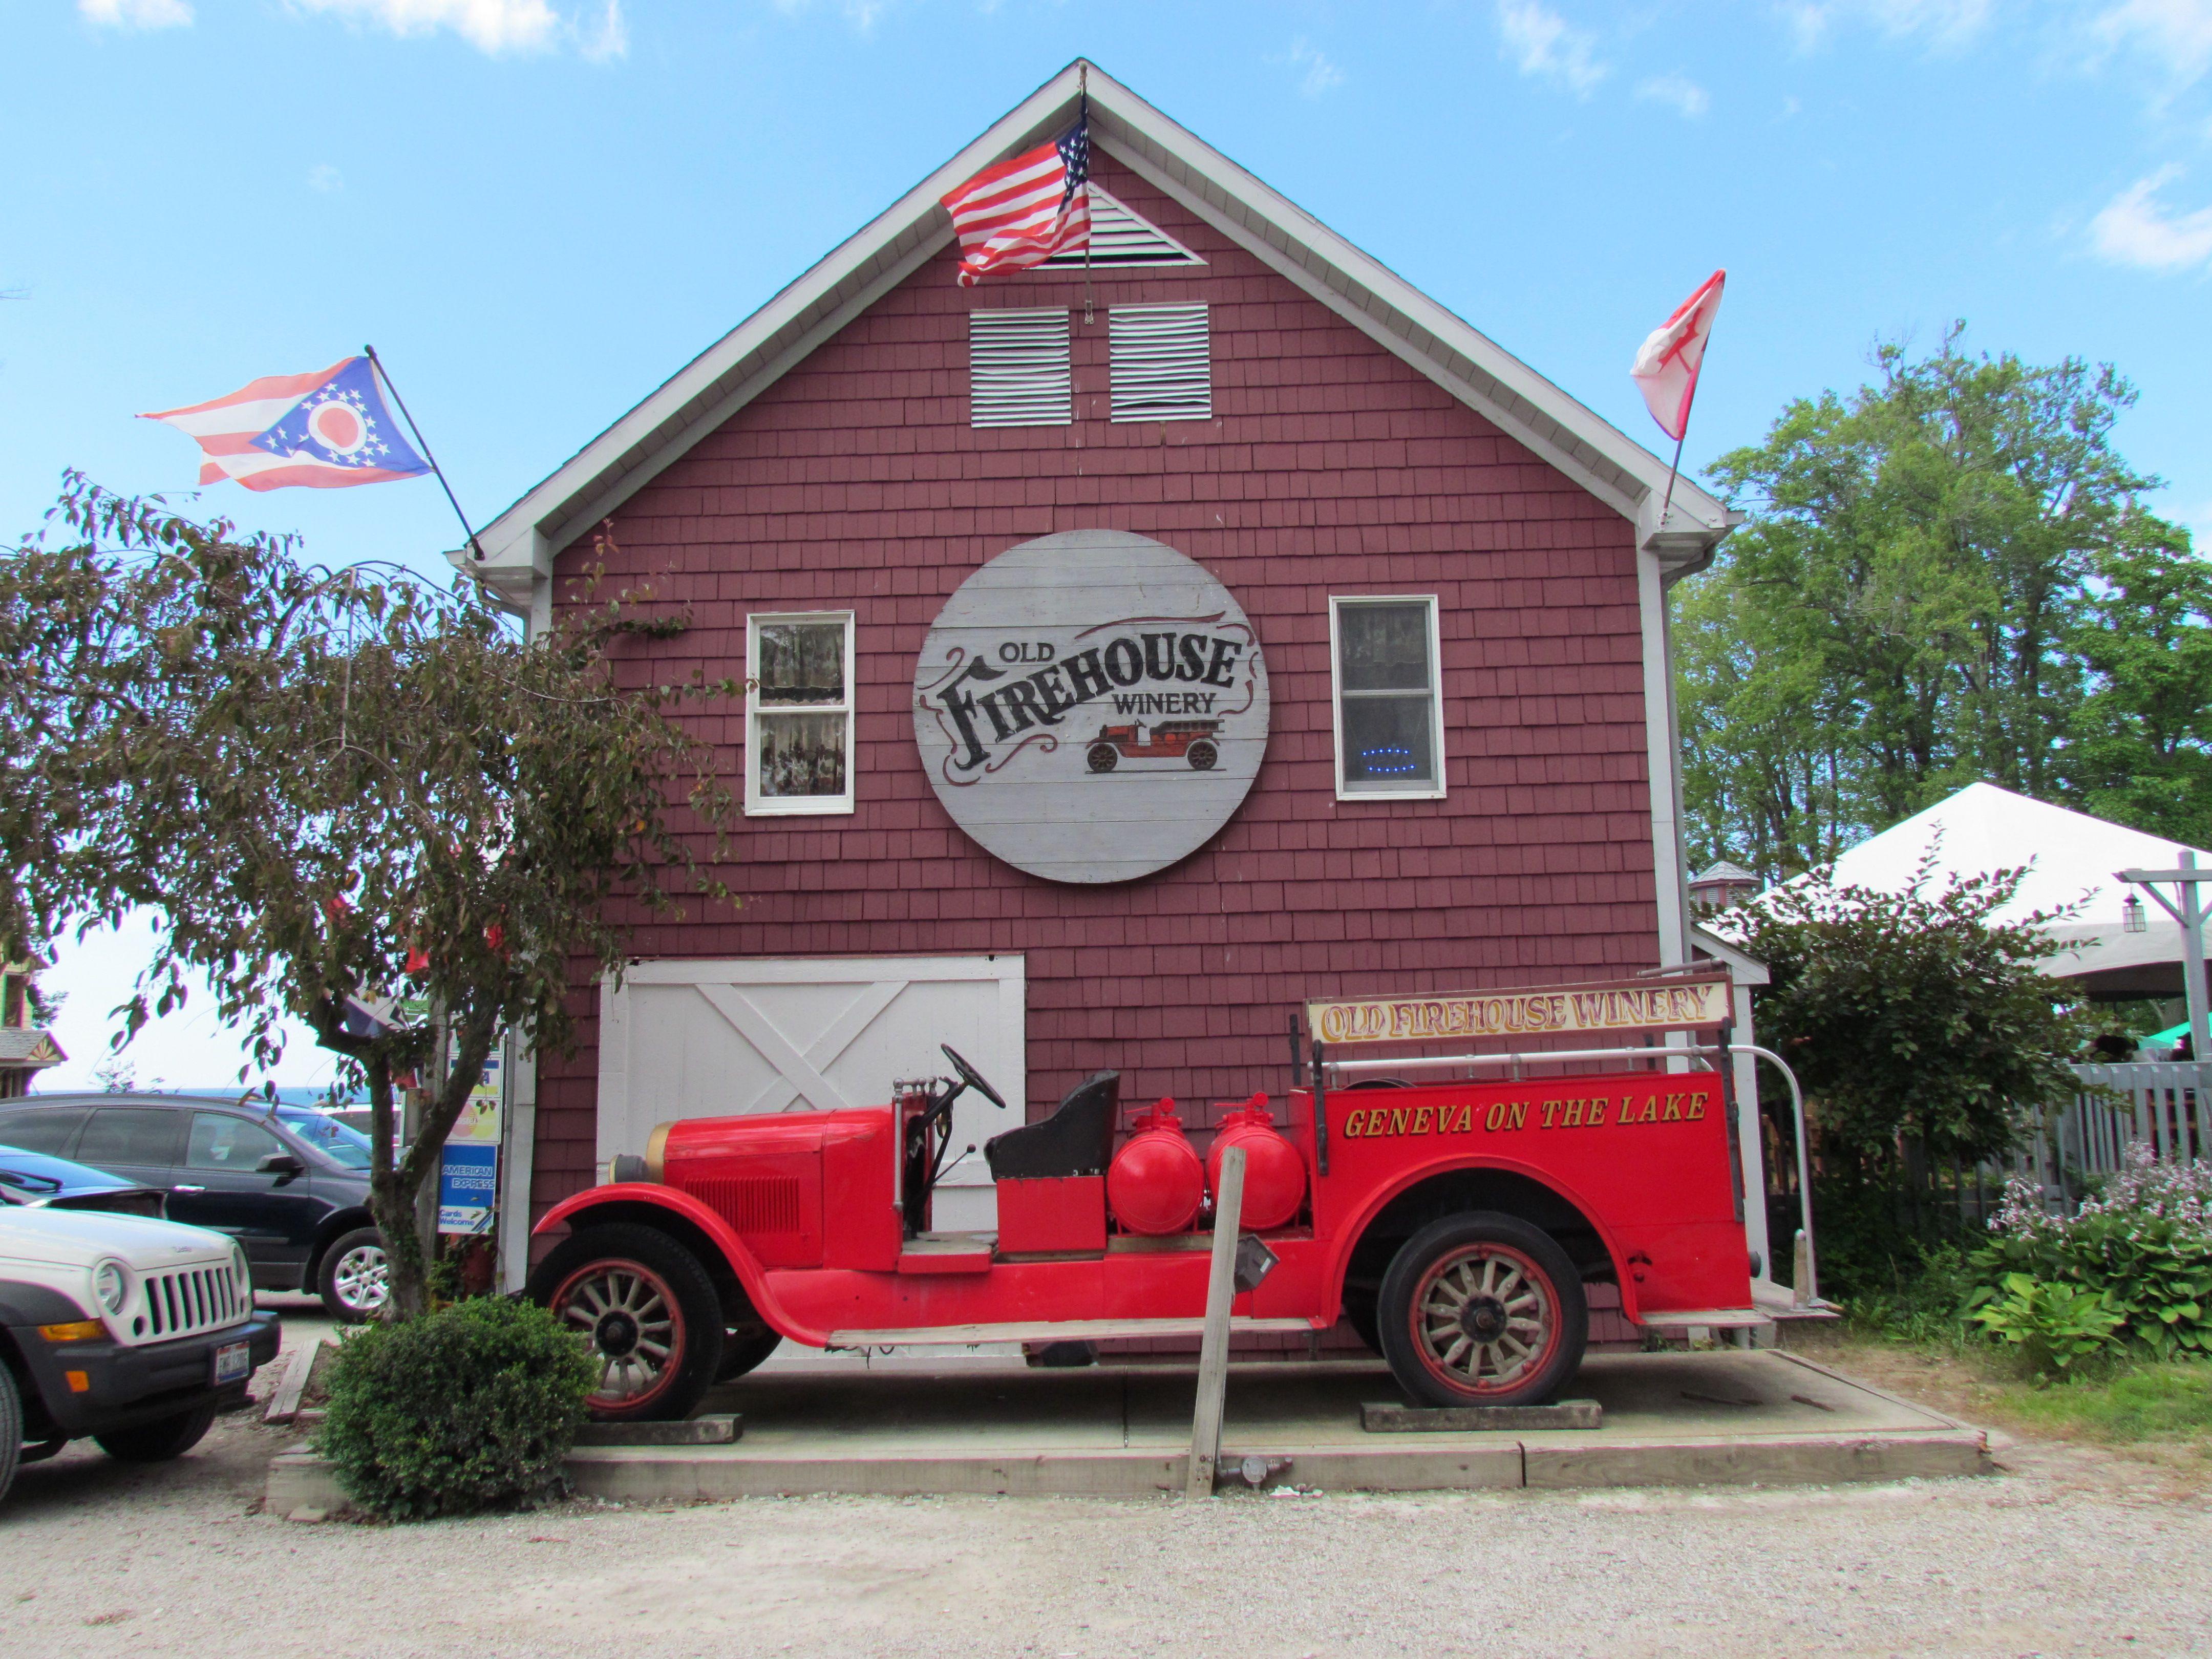 Old Firehouse Winery Winery Ohio Lake Geneva